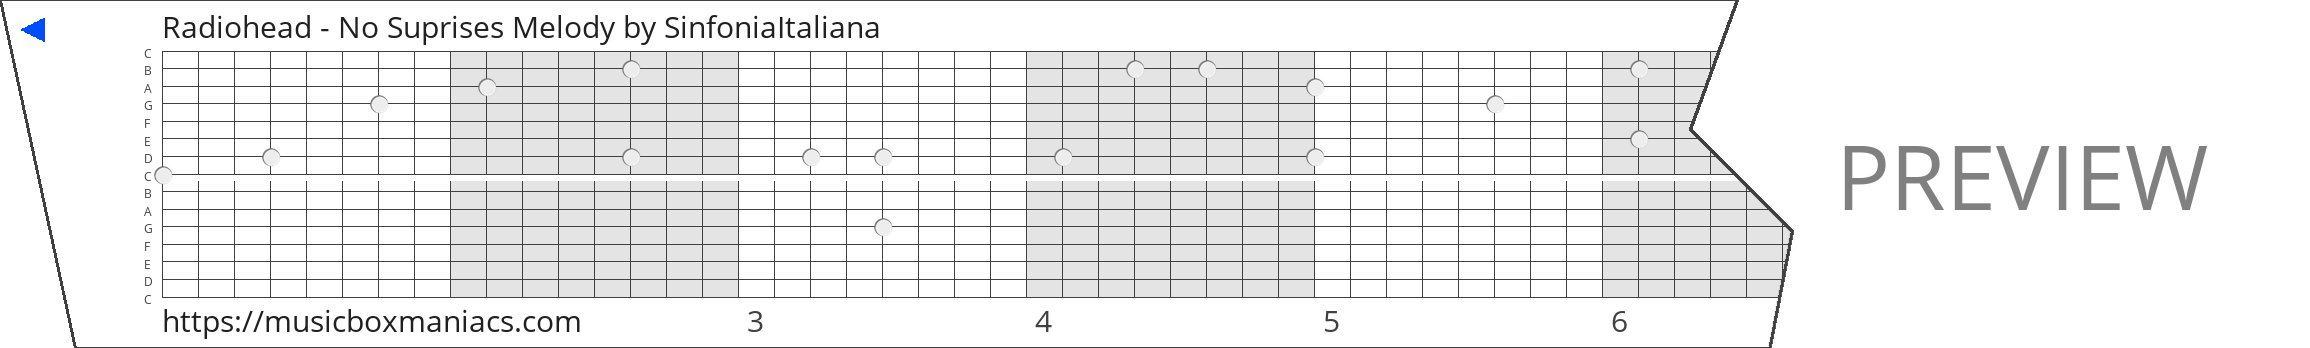 Radiohead - No Suprises Melody 15 note music box paper strip